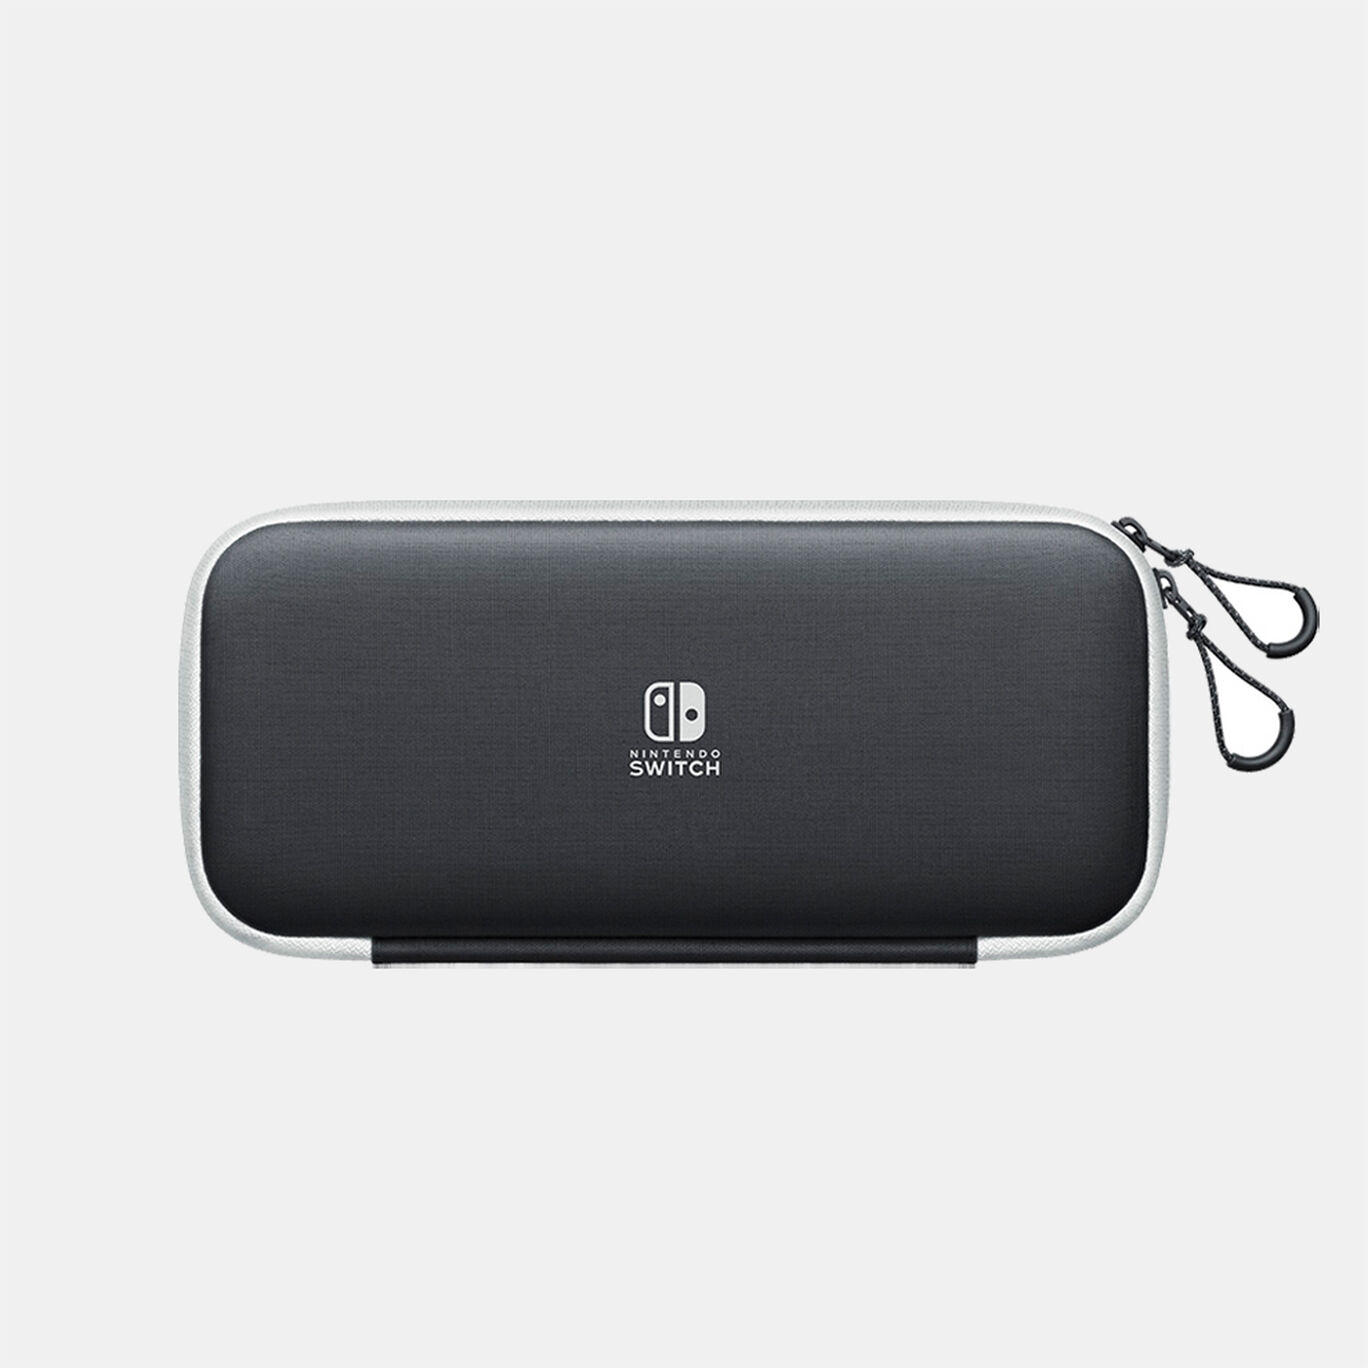 Nintendo Switchキャリングケース(画面保護シート付き)